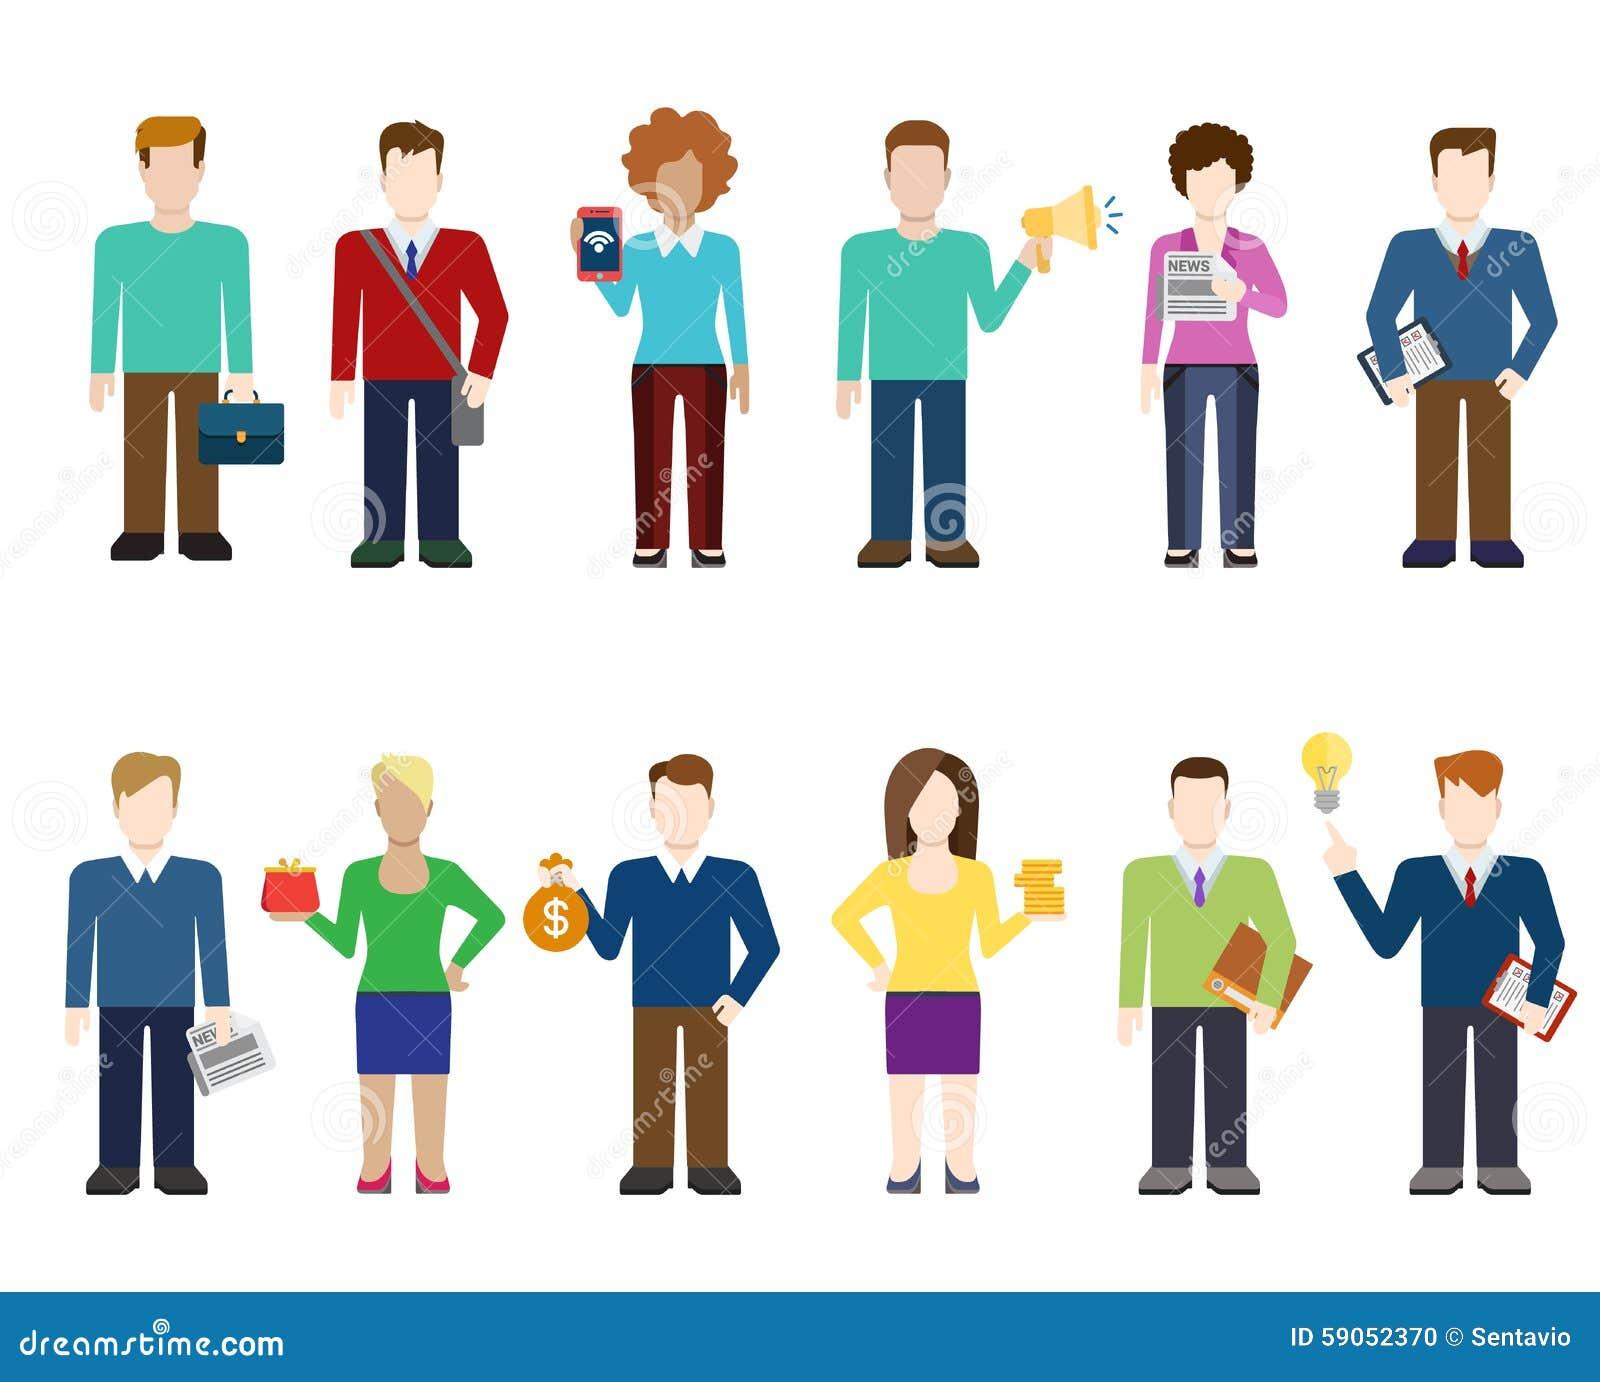 people infographic icon wwwpixsharkcom images